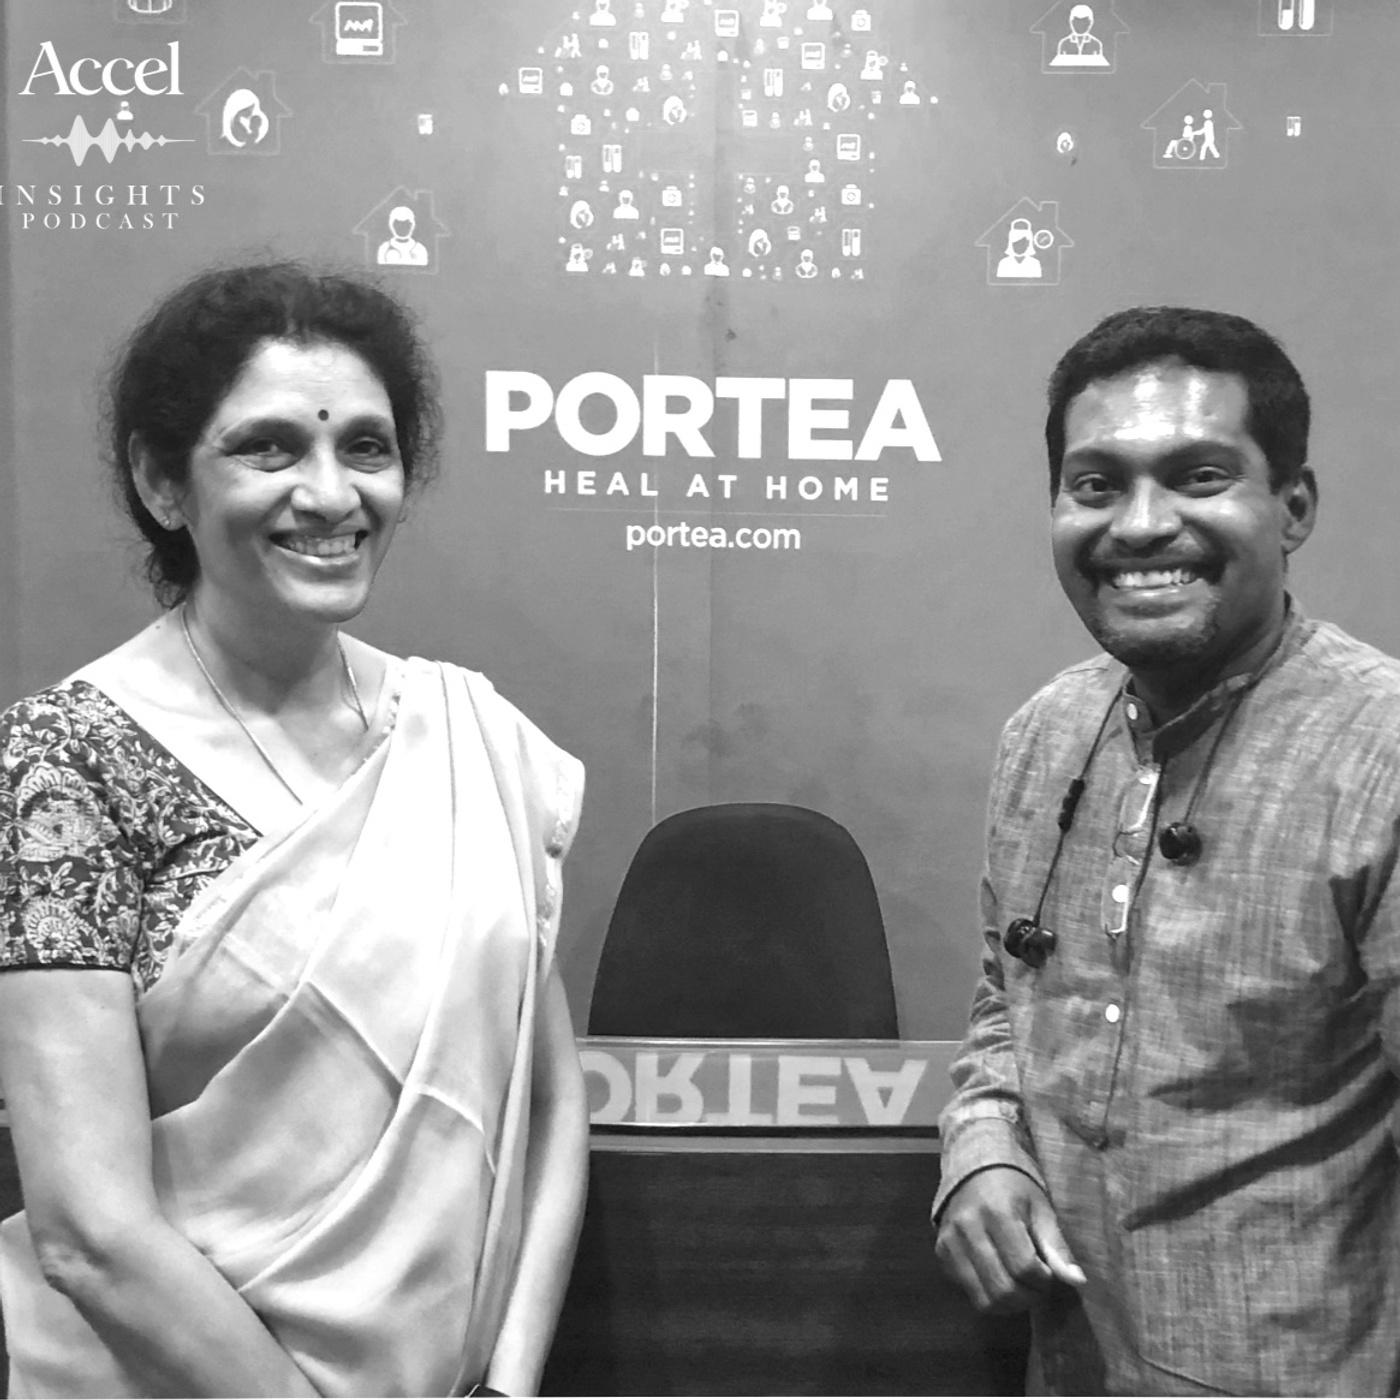 INSIGHTS #27 — Serial entrepreneur Meena Ganesh on creating impact on people's lives